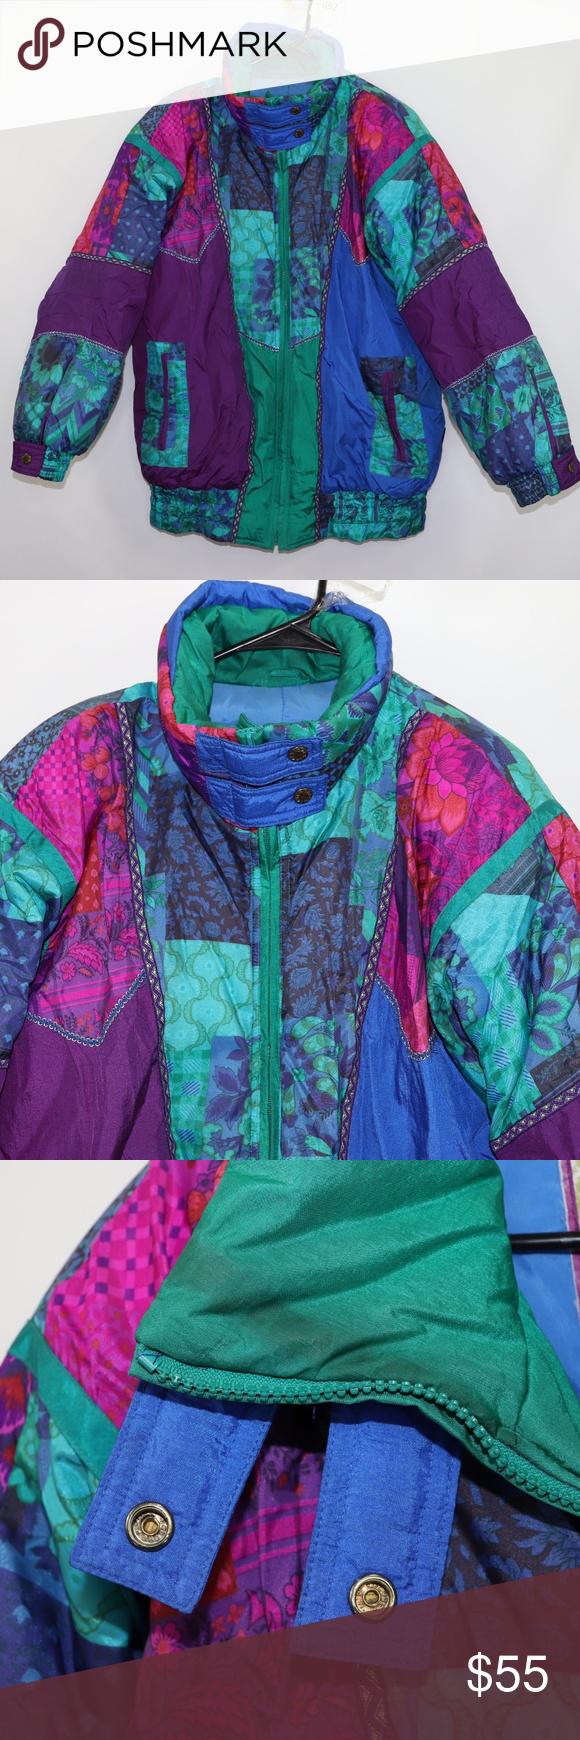 Vtg 90s Izzi Puffer Color Block Purple Jacket Sz M Purple Jacket Puffer Jacket Women Jackets For Women [ 1740 x 580 Pixel ]